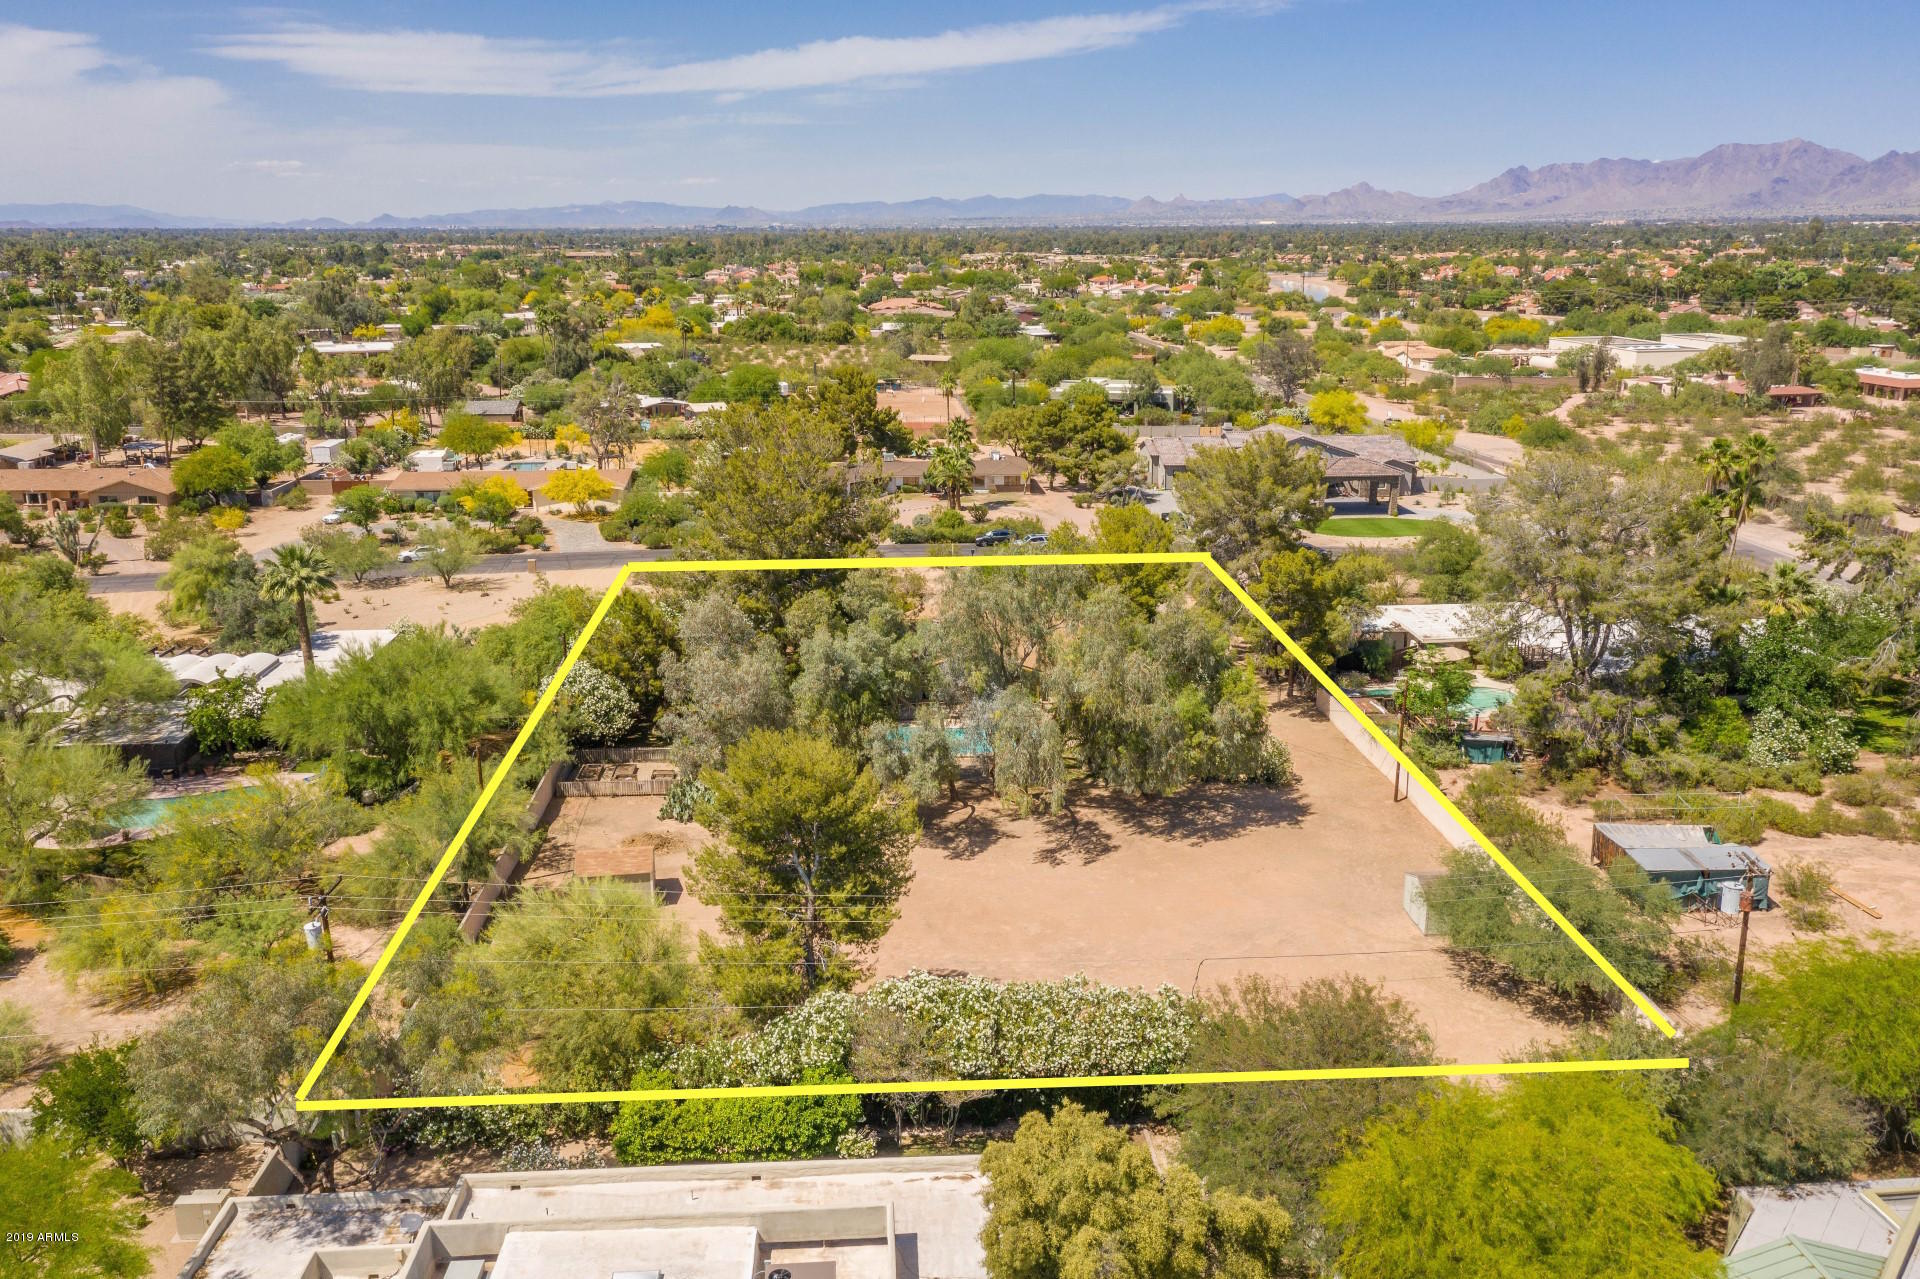 MLS 5923186 7523 E BERRIDGE Lane, Scottsdale, AZ 85250 Scottsdale AZ Private Pool